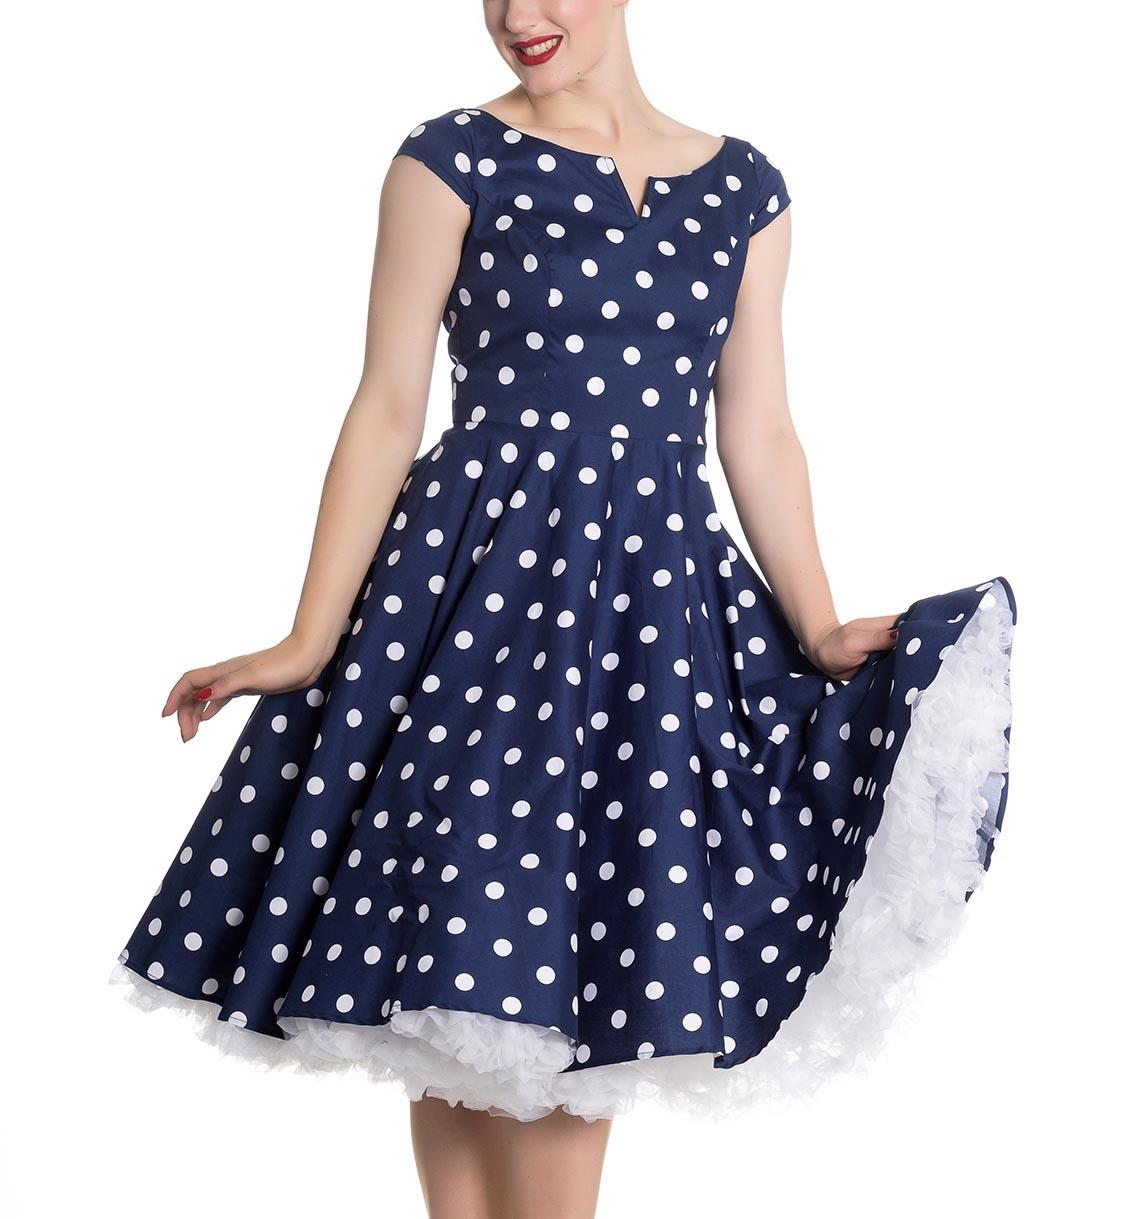 Hell-Bunny-50s-Dress-Polka-Dot-NICKY-Pin-Up-Rockabilly-Navy-Blue-All-Sizes thumbnail 9